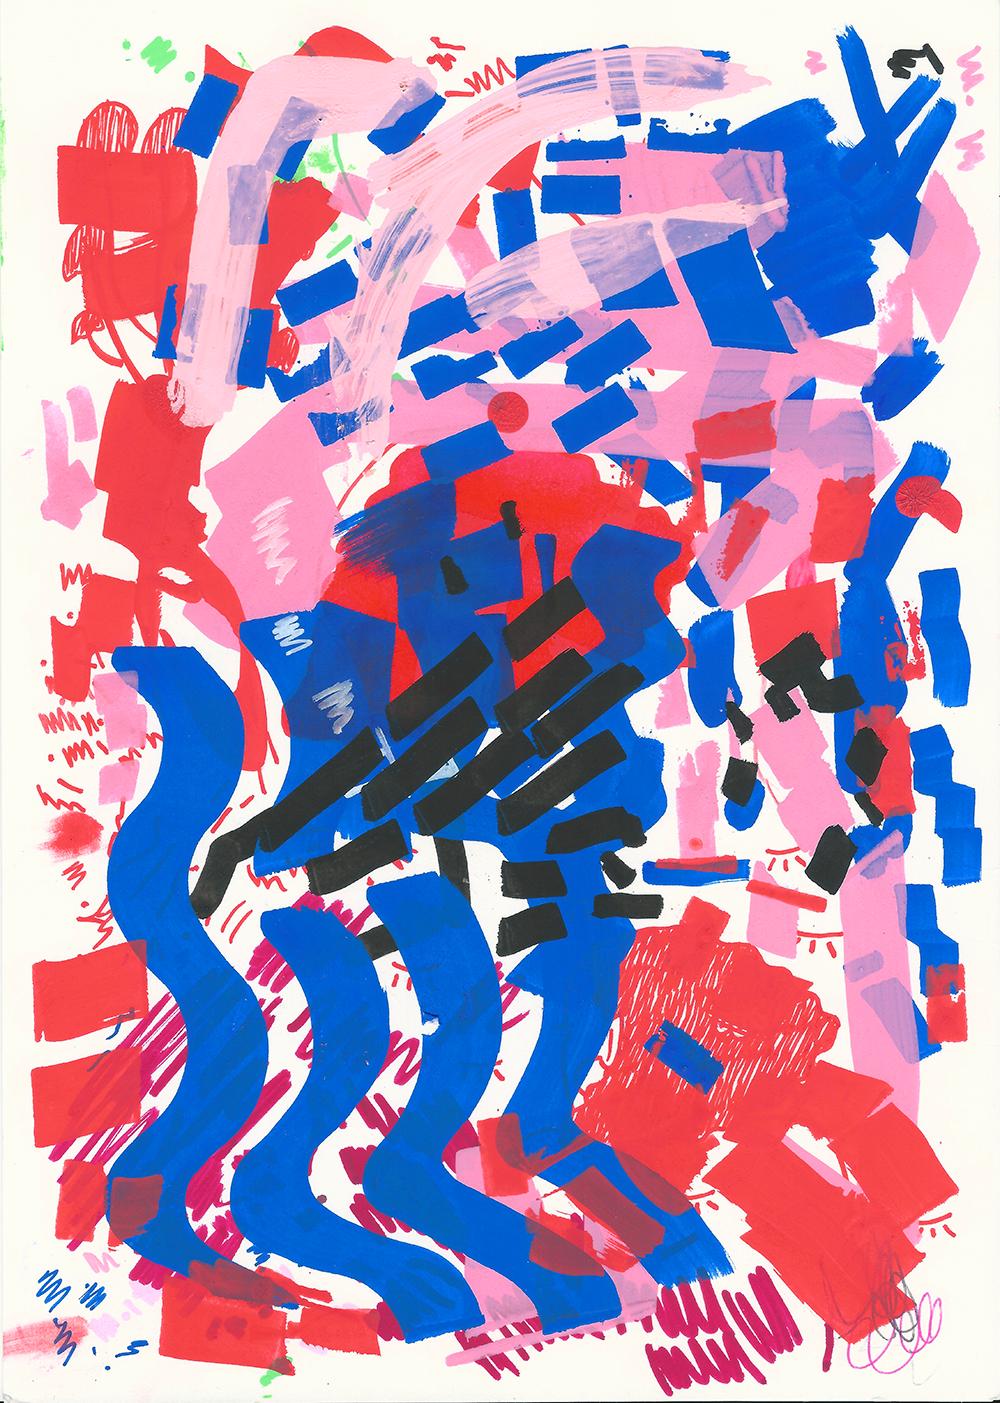 Junk_HolbeinKentPad180K_001_RGB300.png